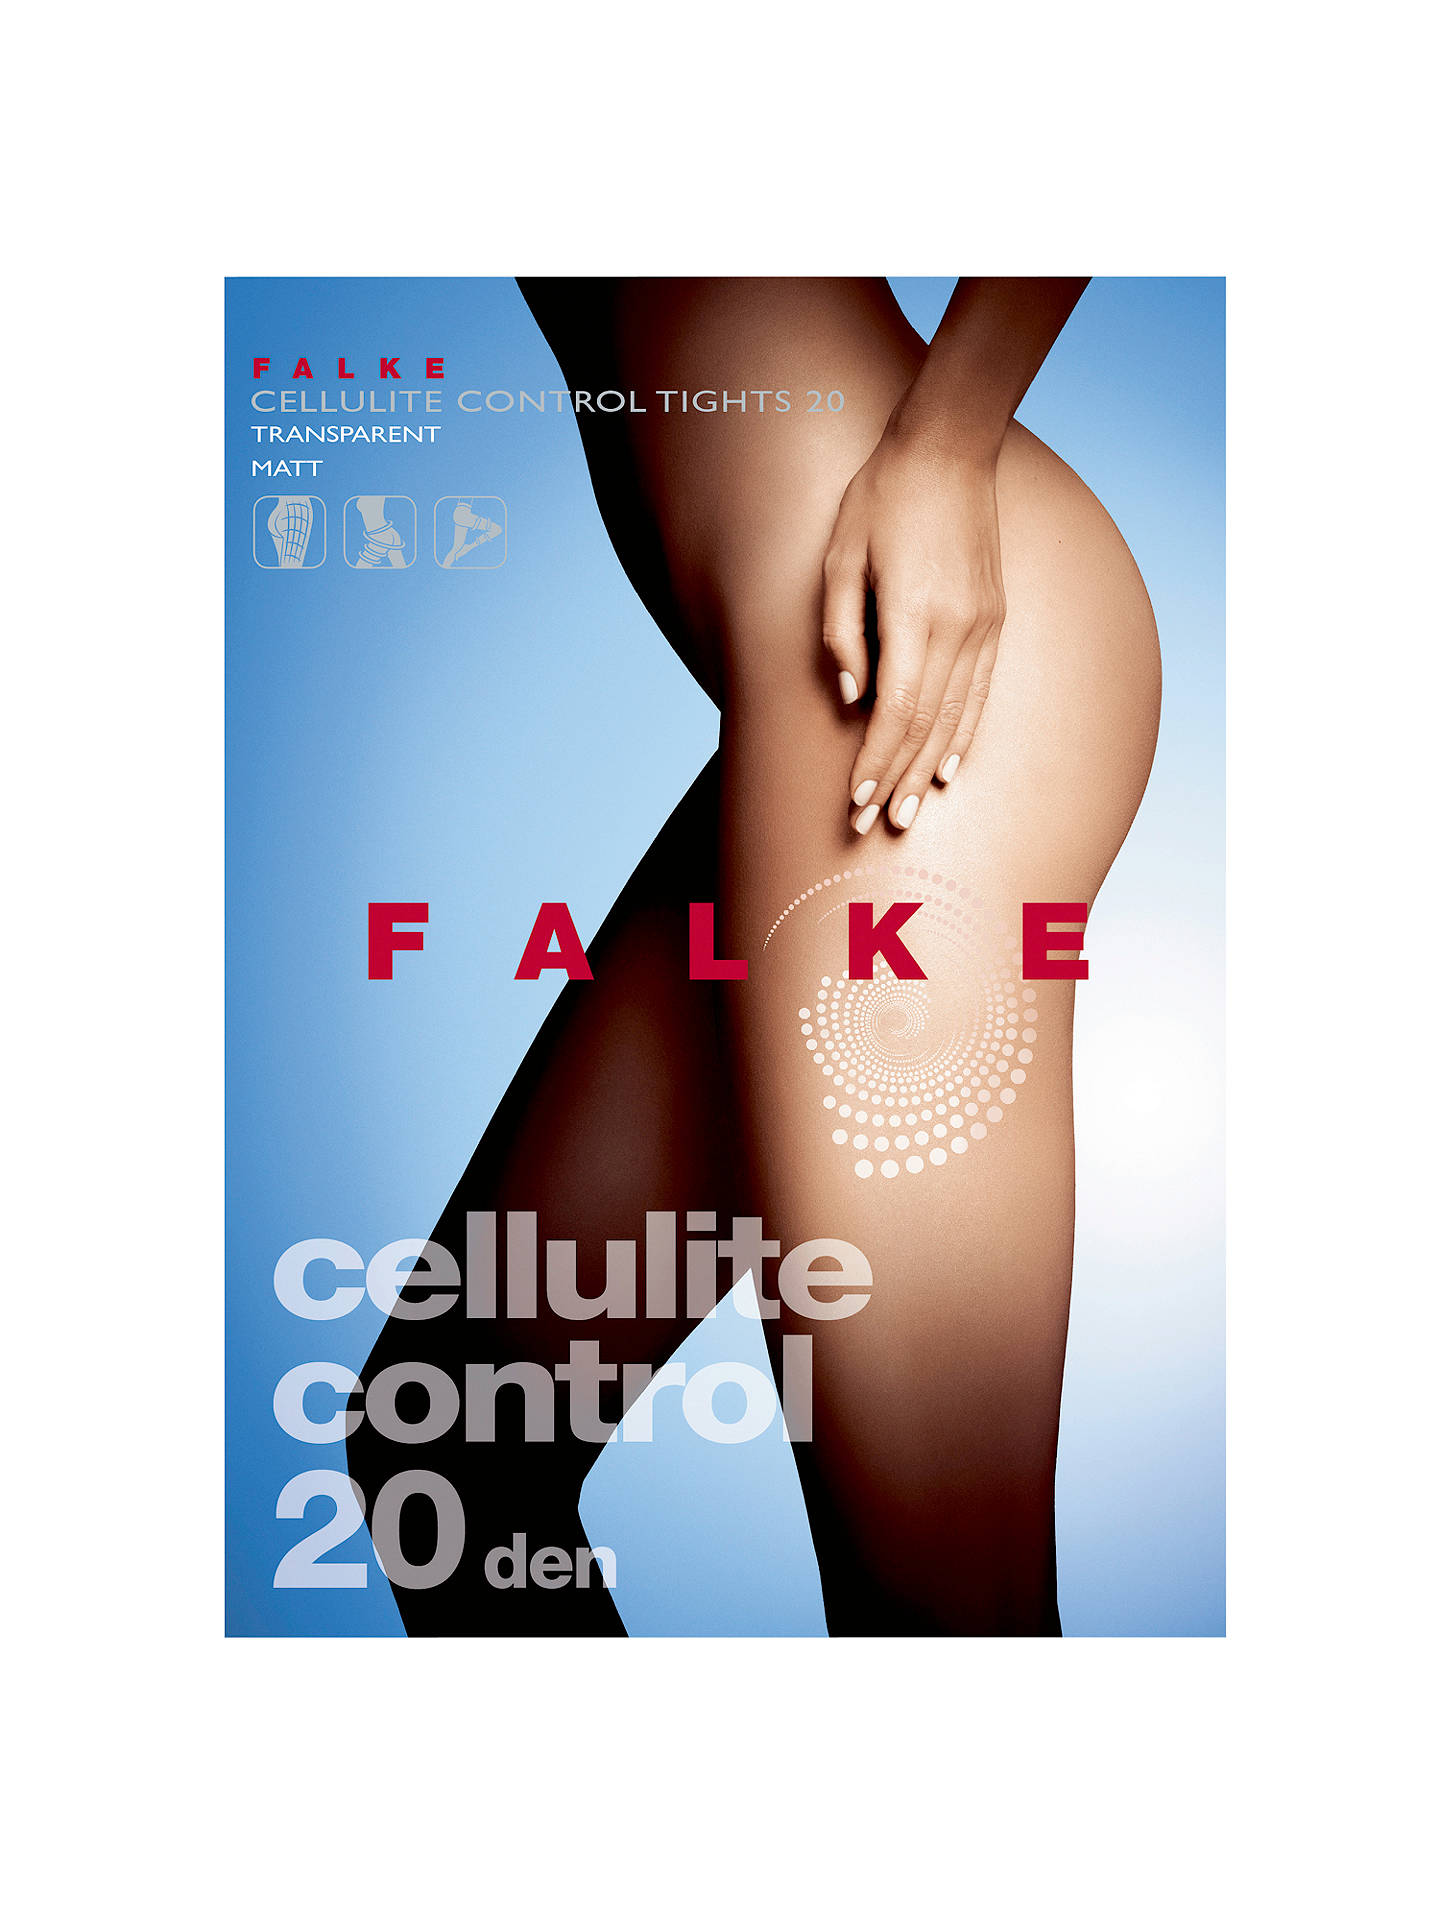 195479fbf8023 Buy FALKE 20 Denier Cellulite Control Tights, Cocoon, S Online at  johnlewis.com ...